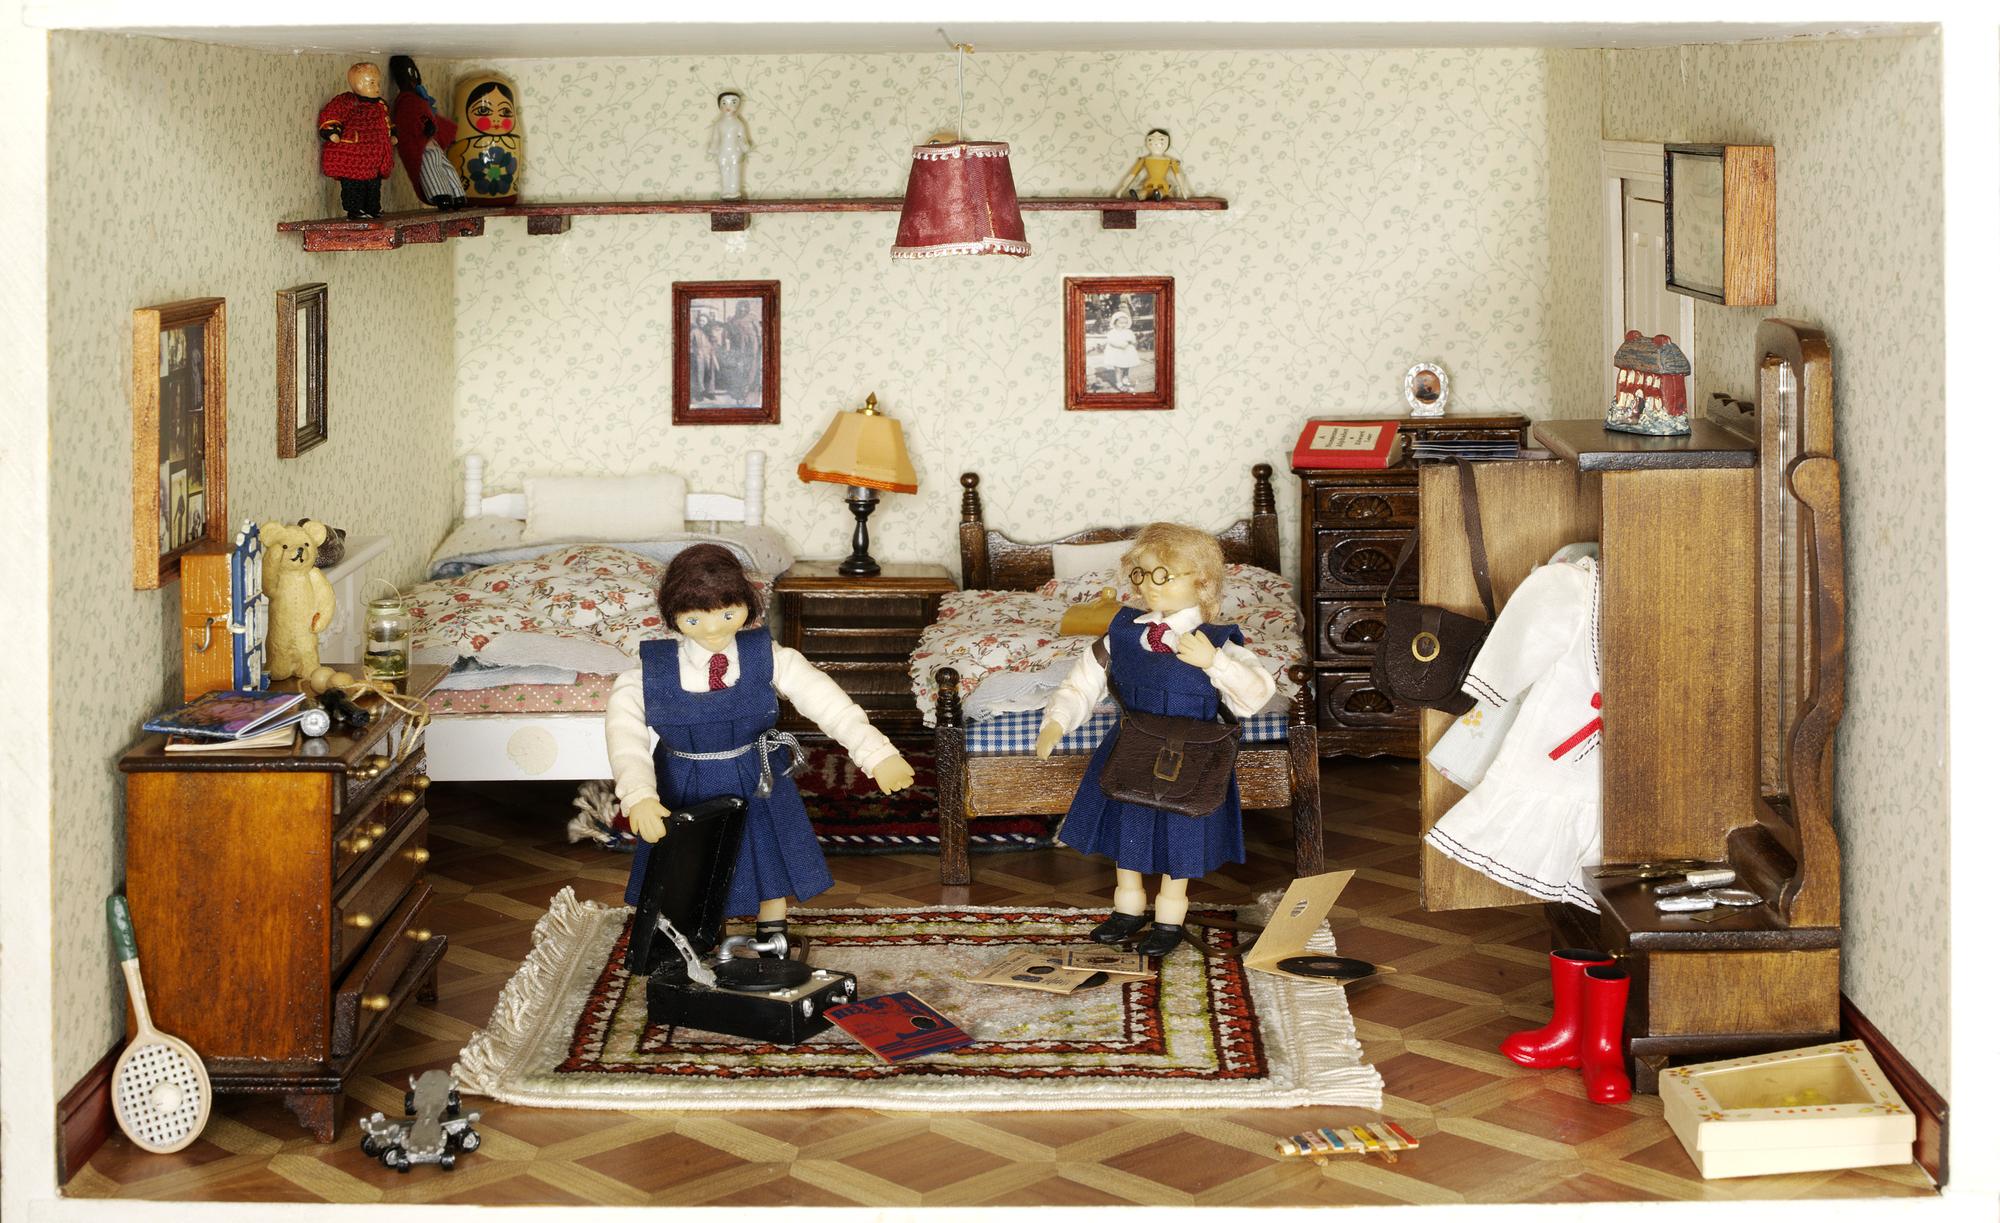 Children's Doll House Museum